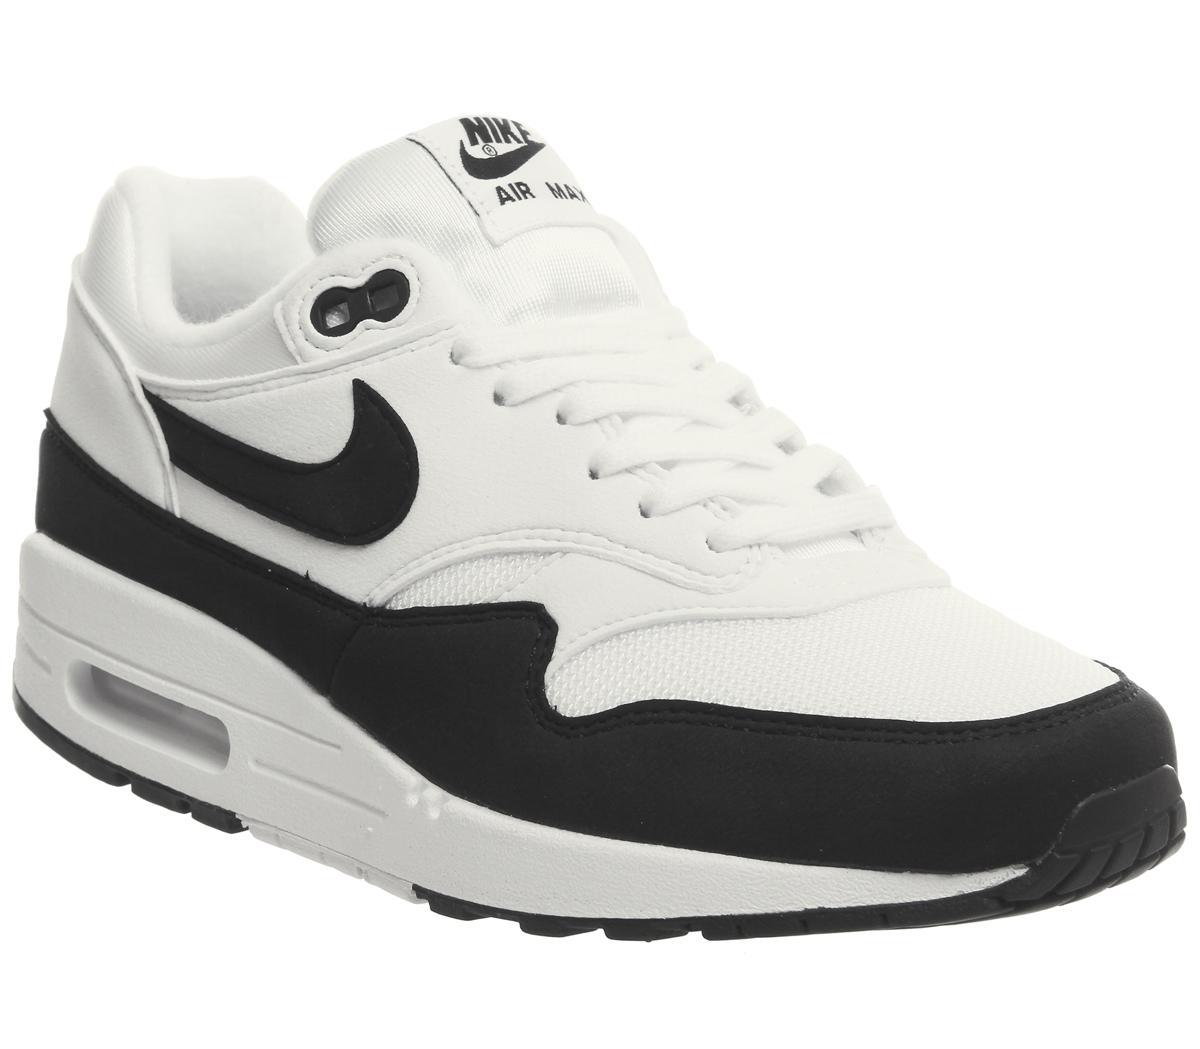 Nike Air Max 1 Trainers White Black F